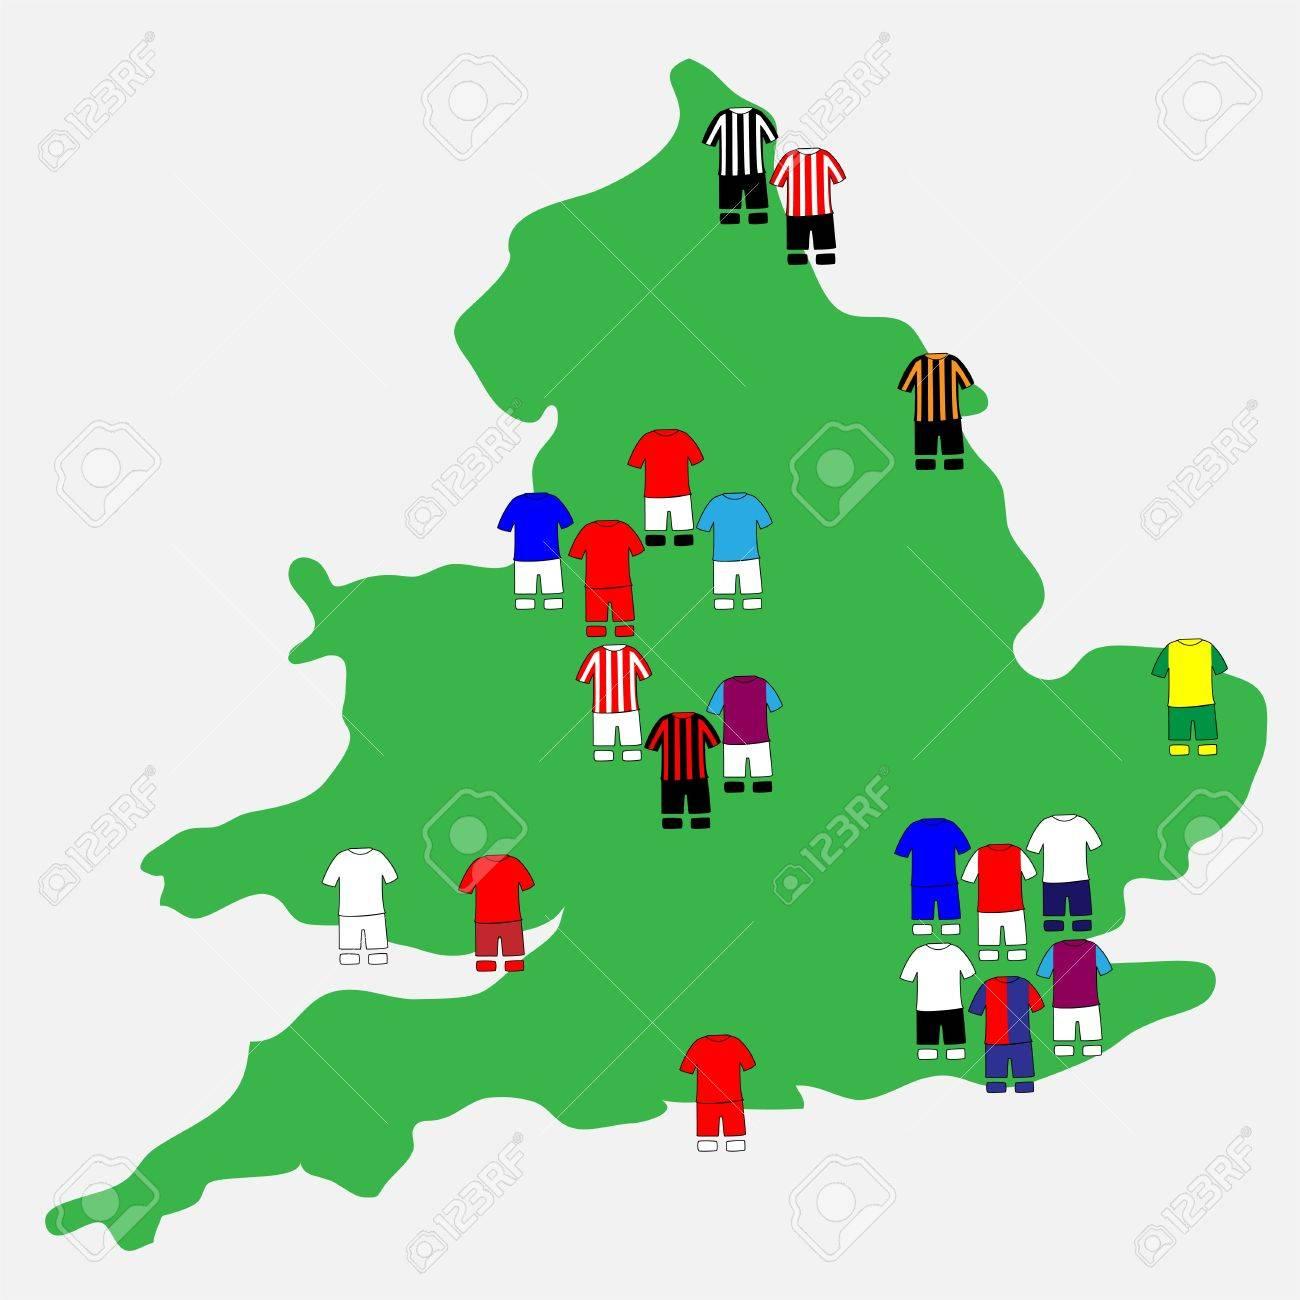 English League Clubs Map 2013-14 Premier League Stock Vector - 21214984